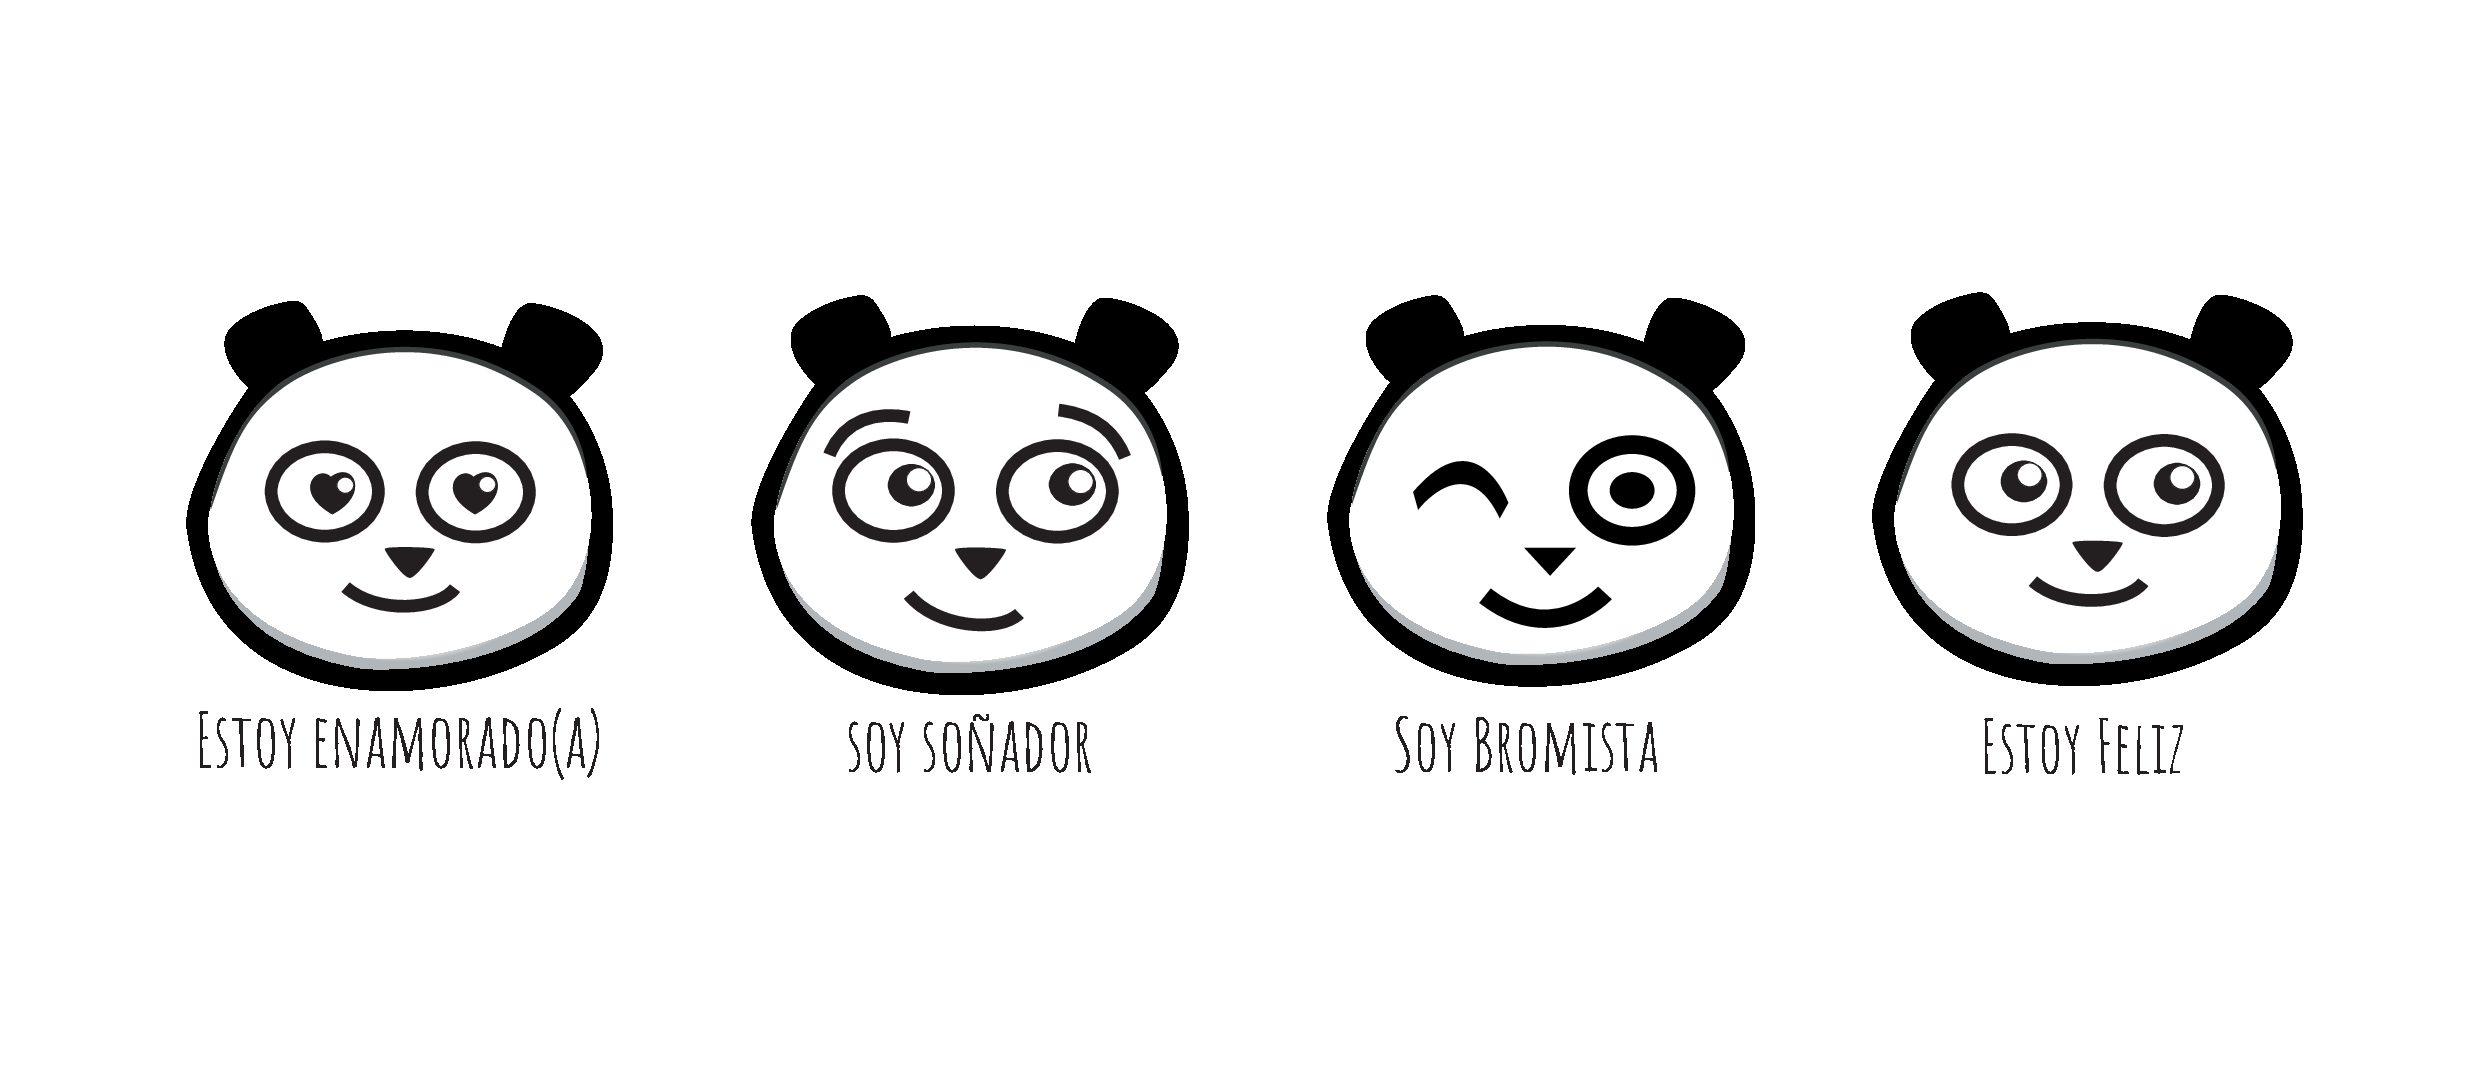 Illustration Panda espangol new